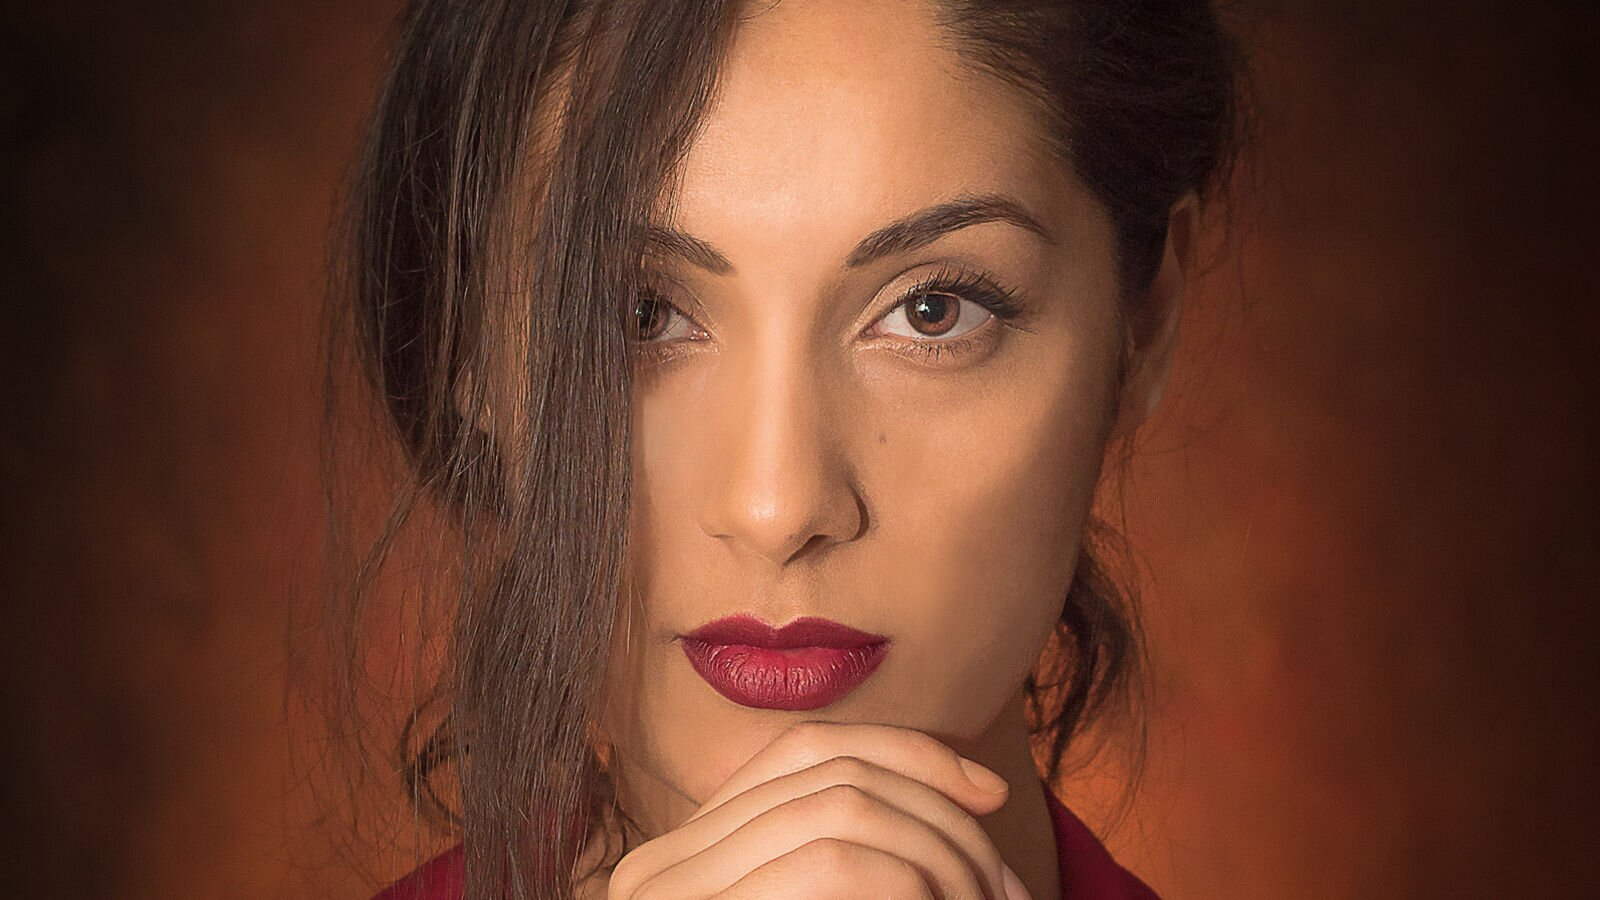 ElisabethSoledad